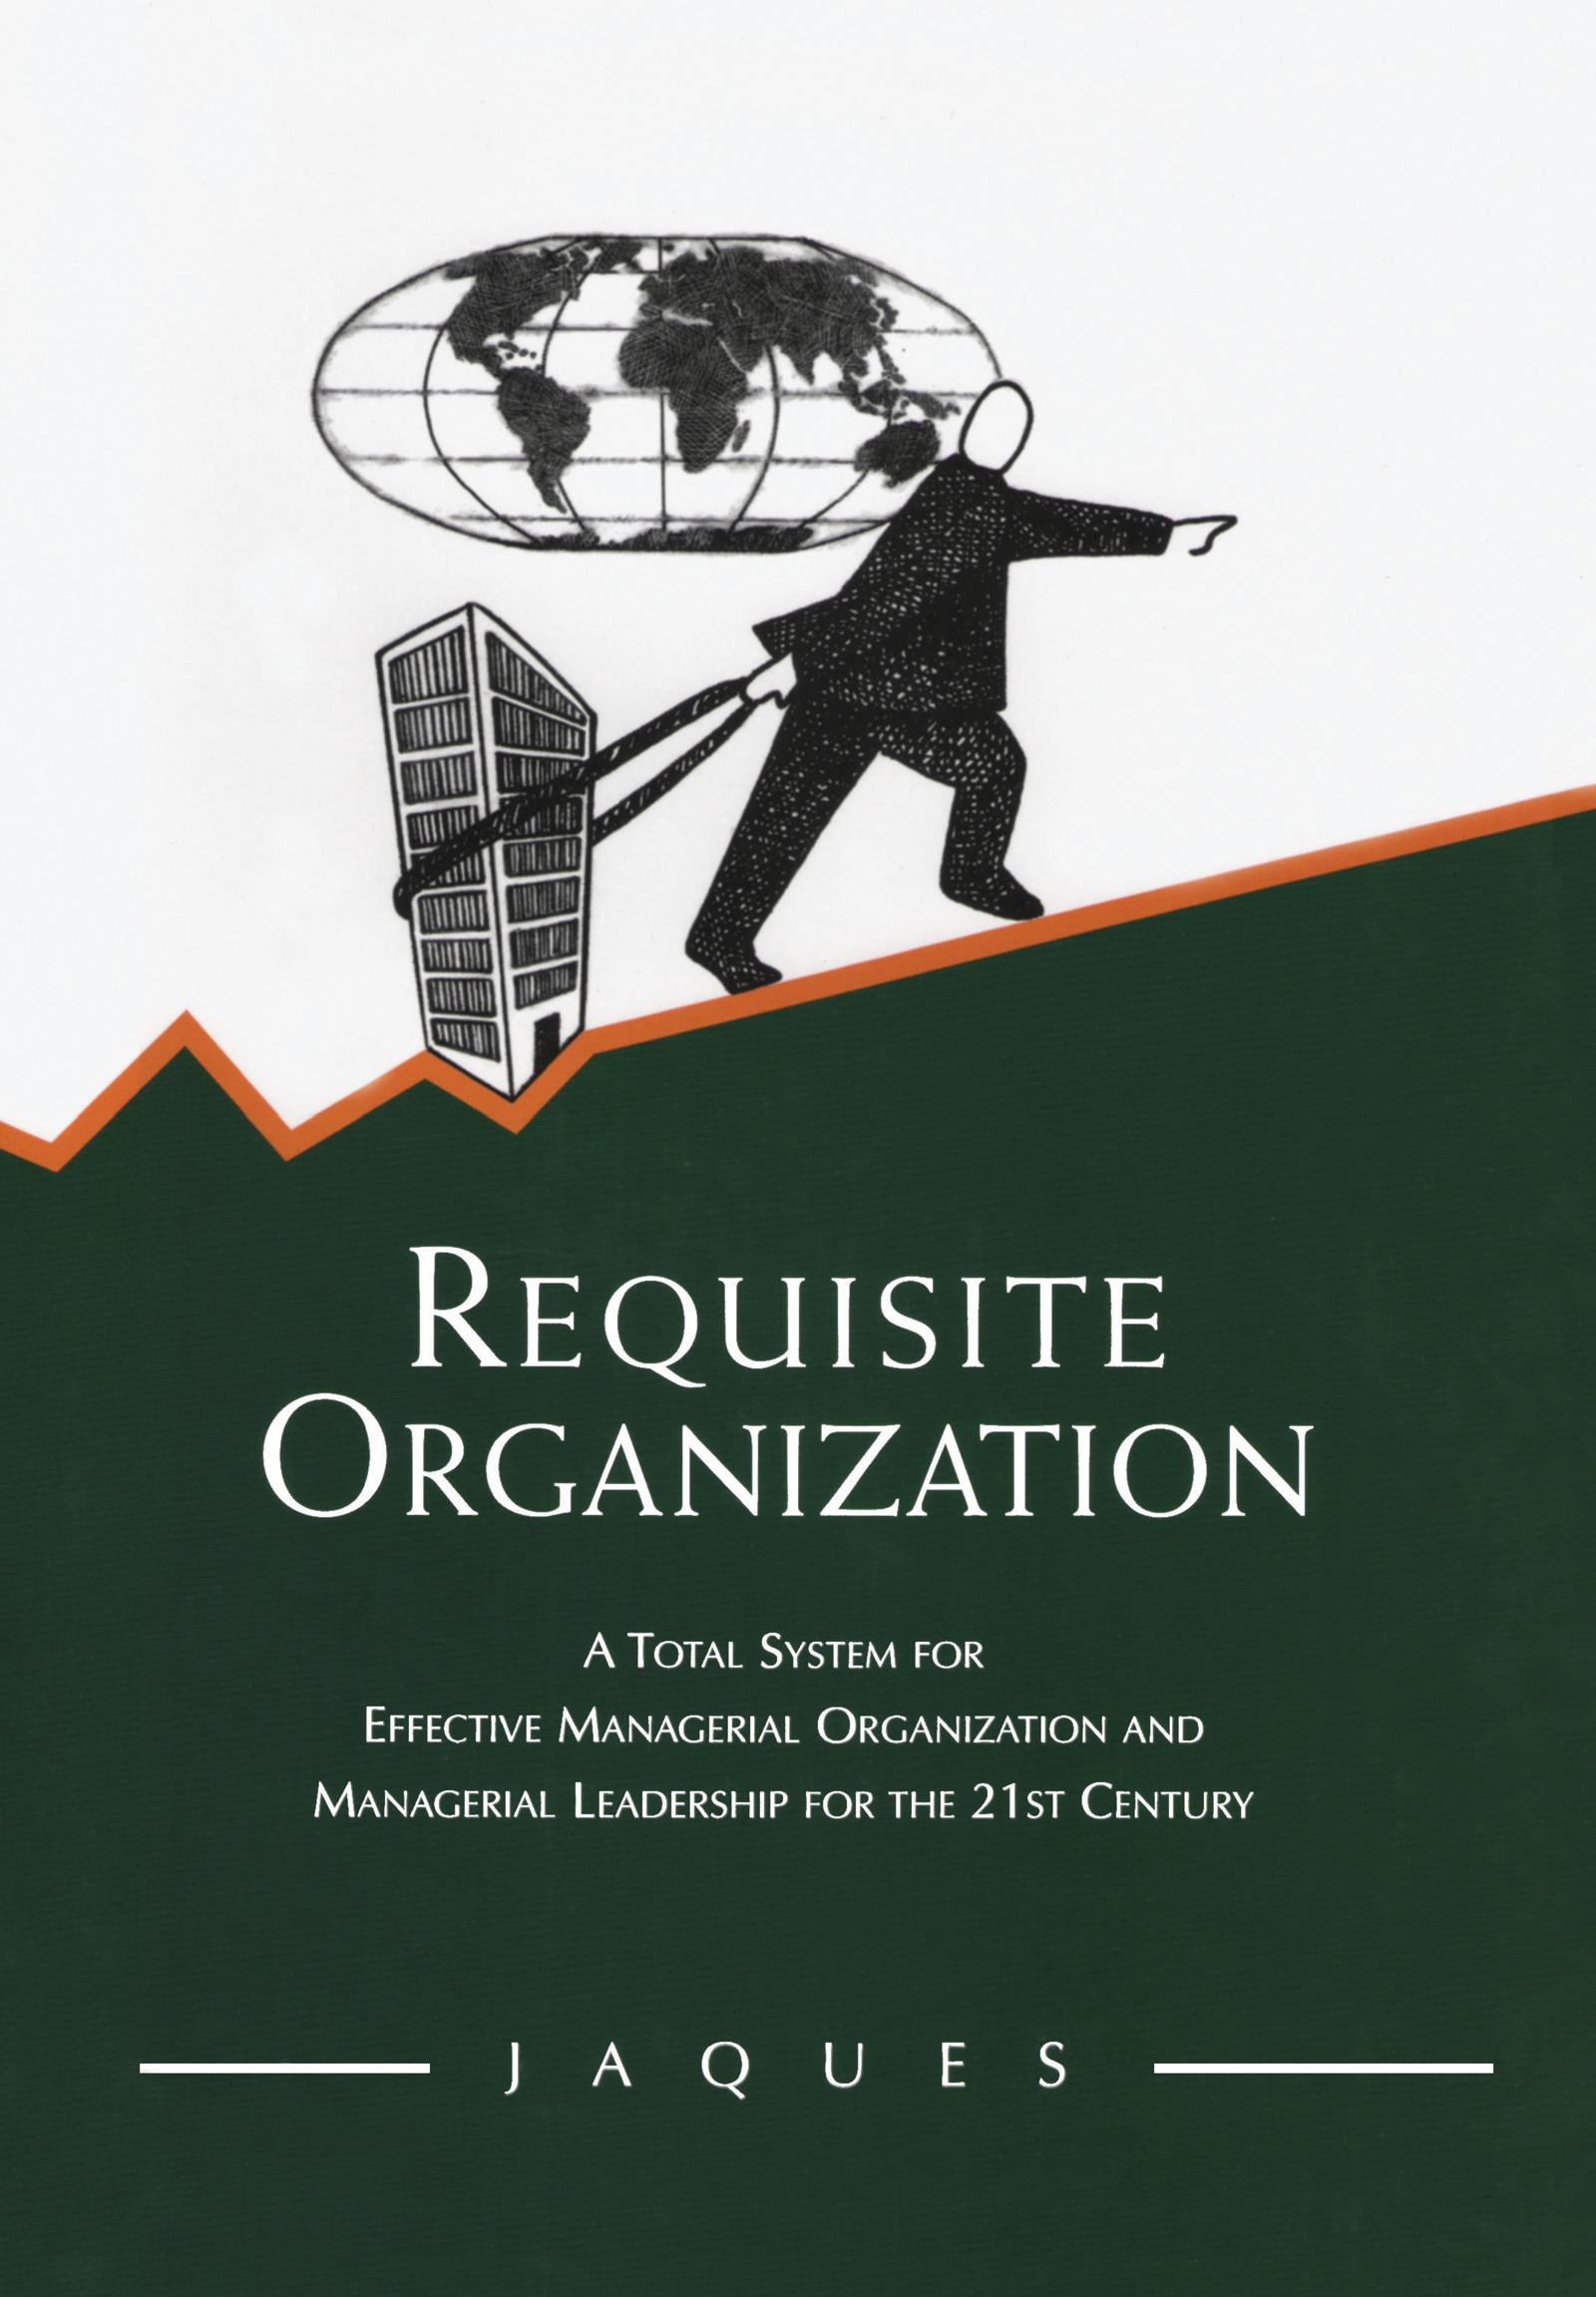 Requisite Organization